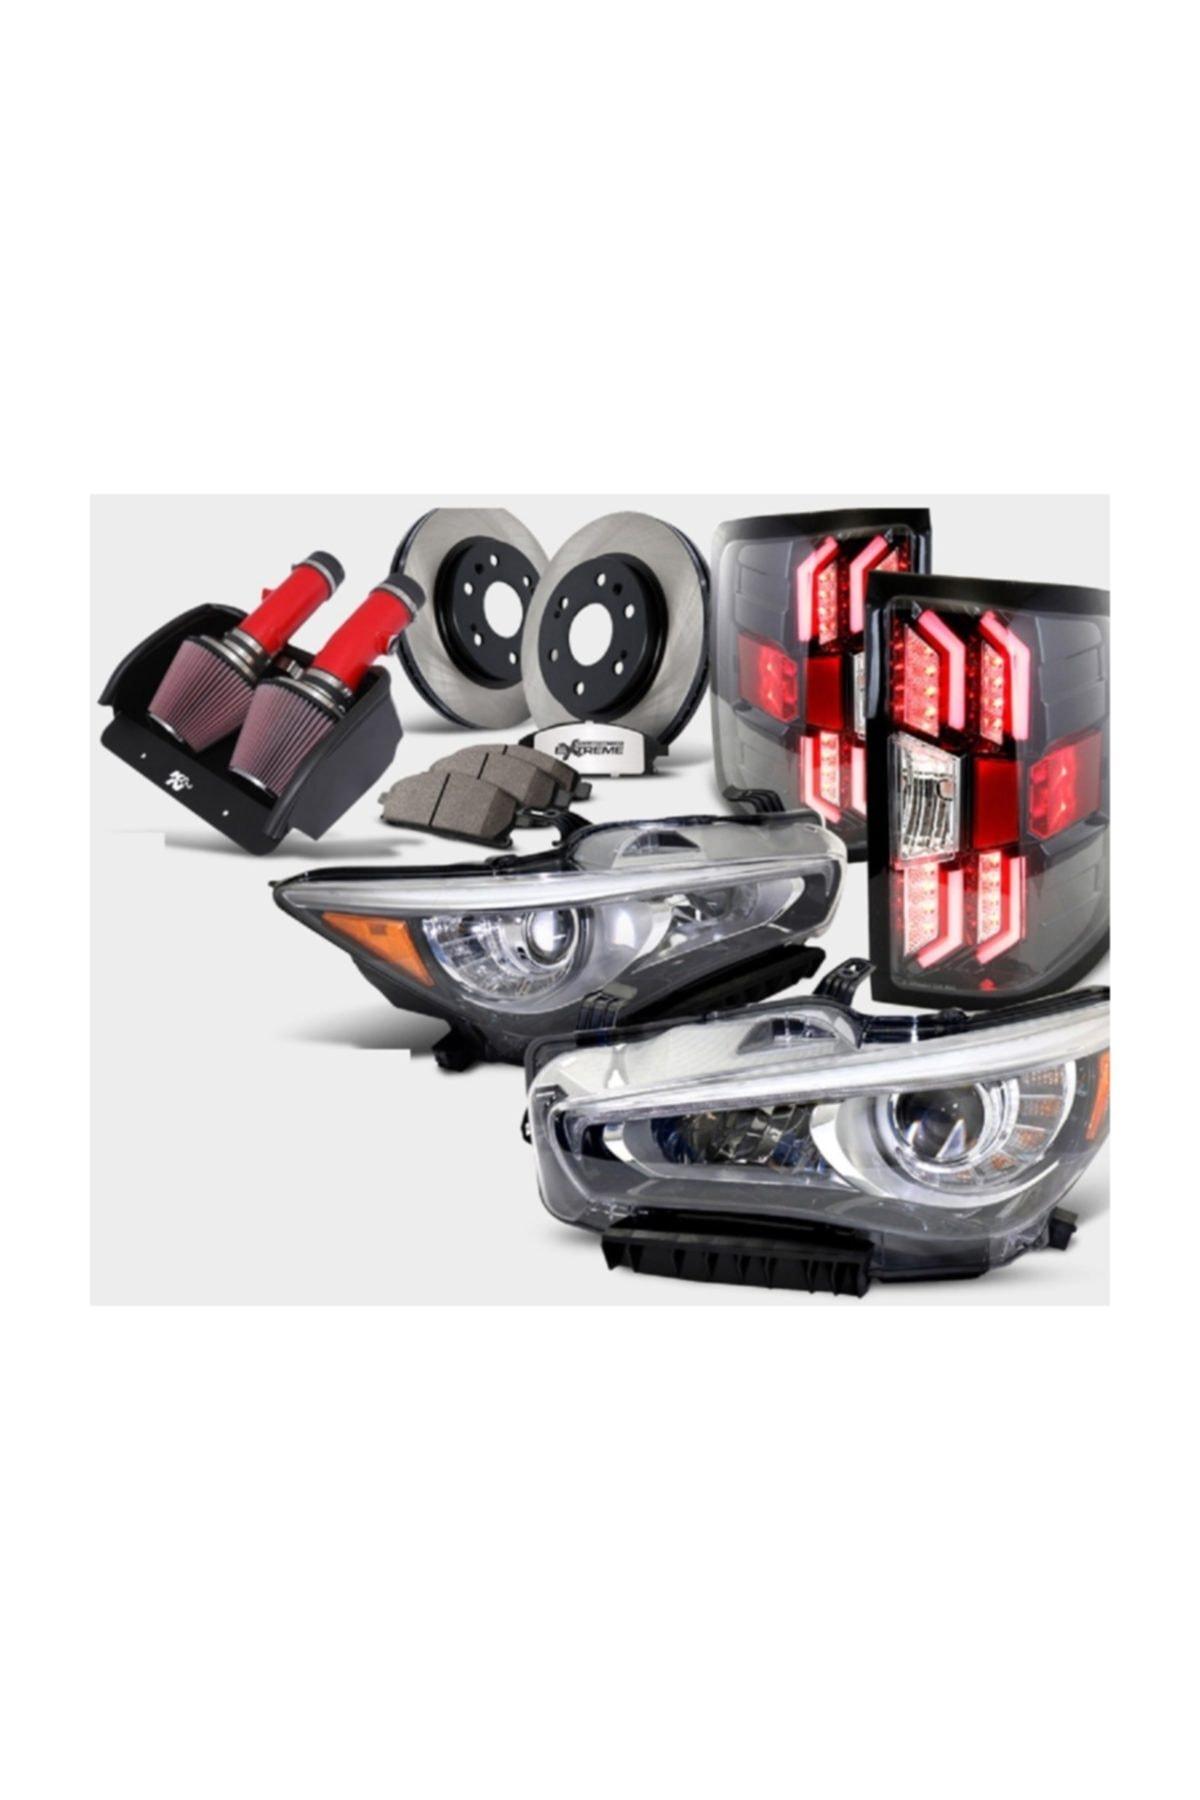 YENMAK Piston+Segman 050-(96.50)-(Nissan: D22 9802 Td27 ) - Yen-4569-050 2